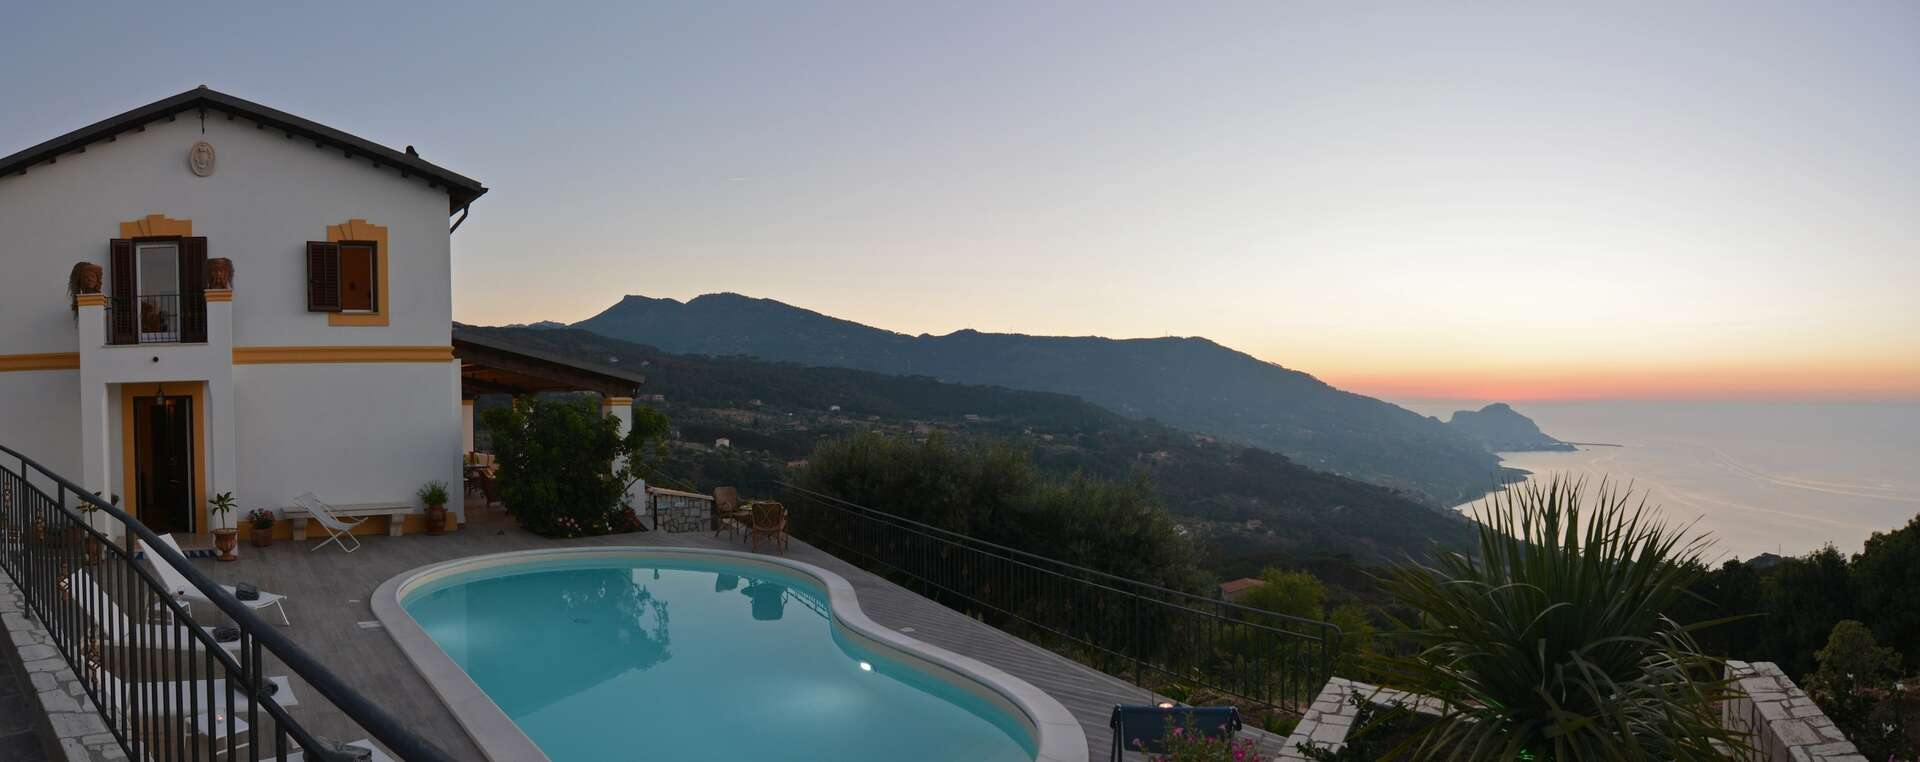 Luxury vacation rentals europe - Italy - Sicily - Cefalu - Villa il Basto - Image 1/29